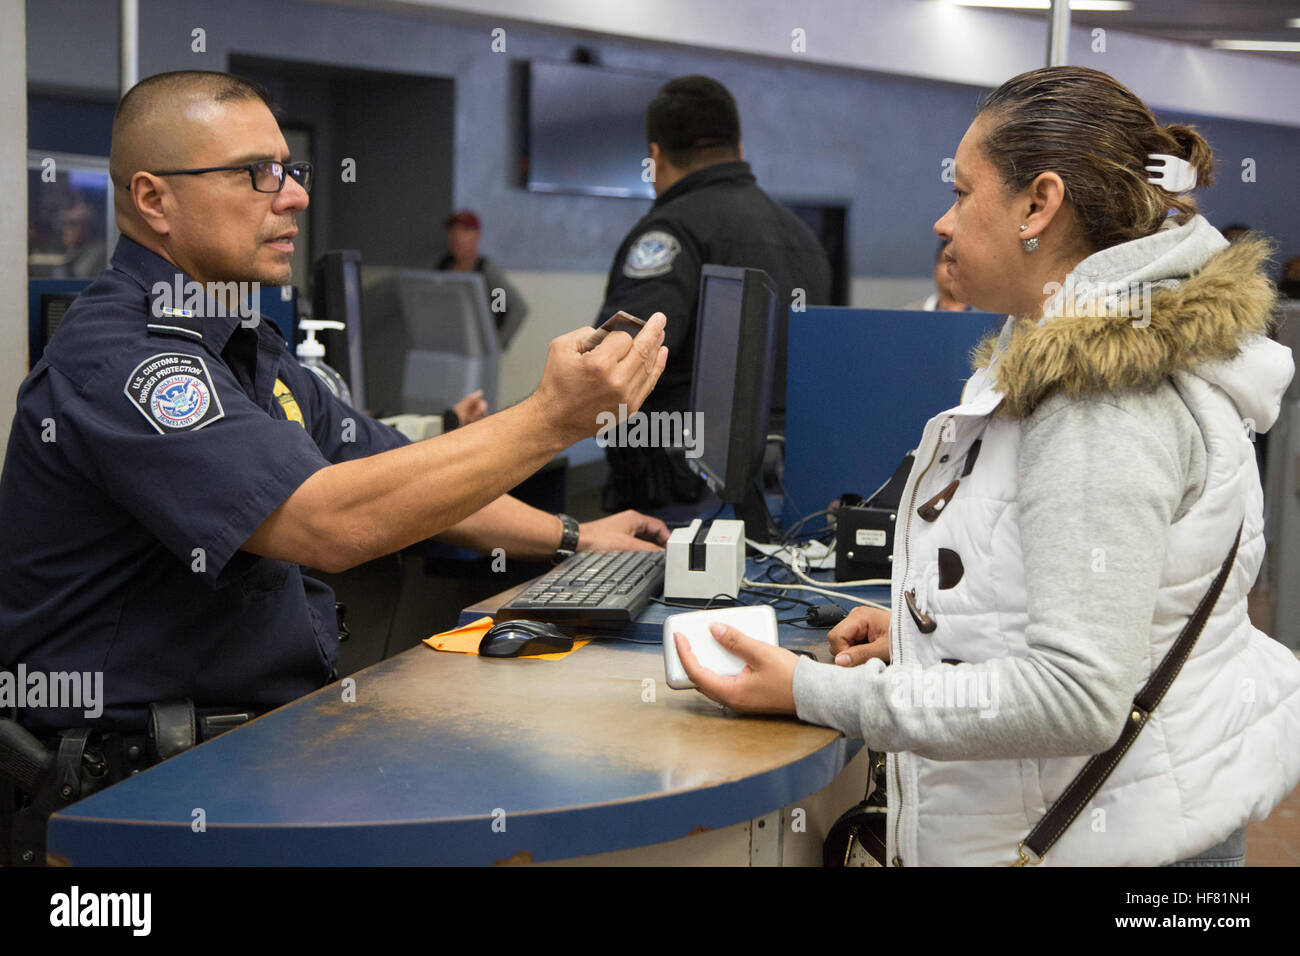 How to Go Through U.S. Customs How to Go Through U.S. Customs new pictures